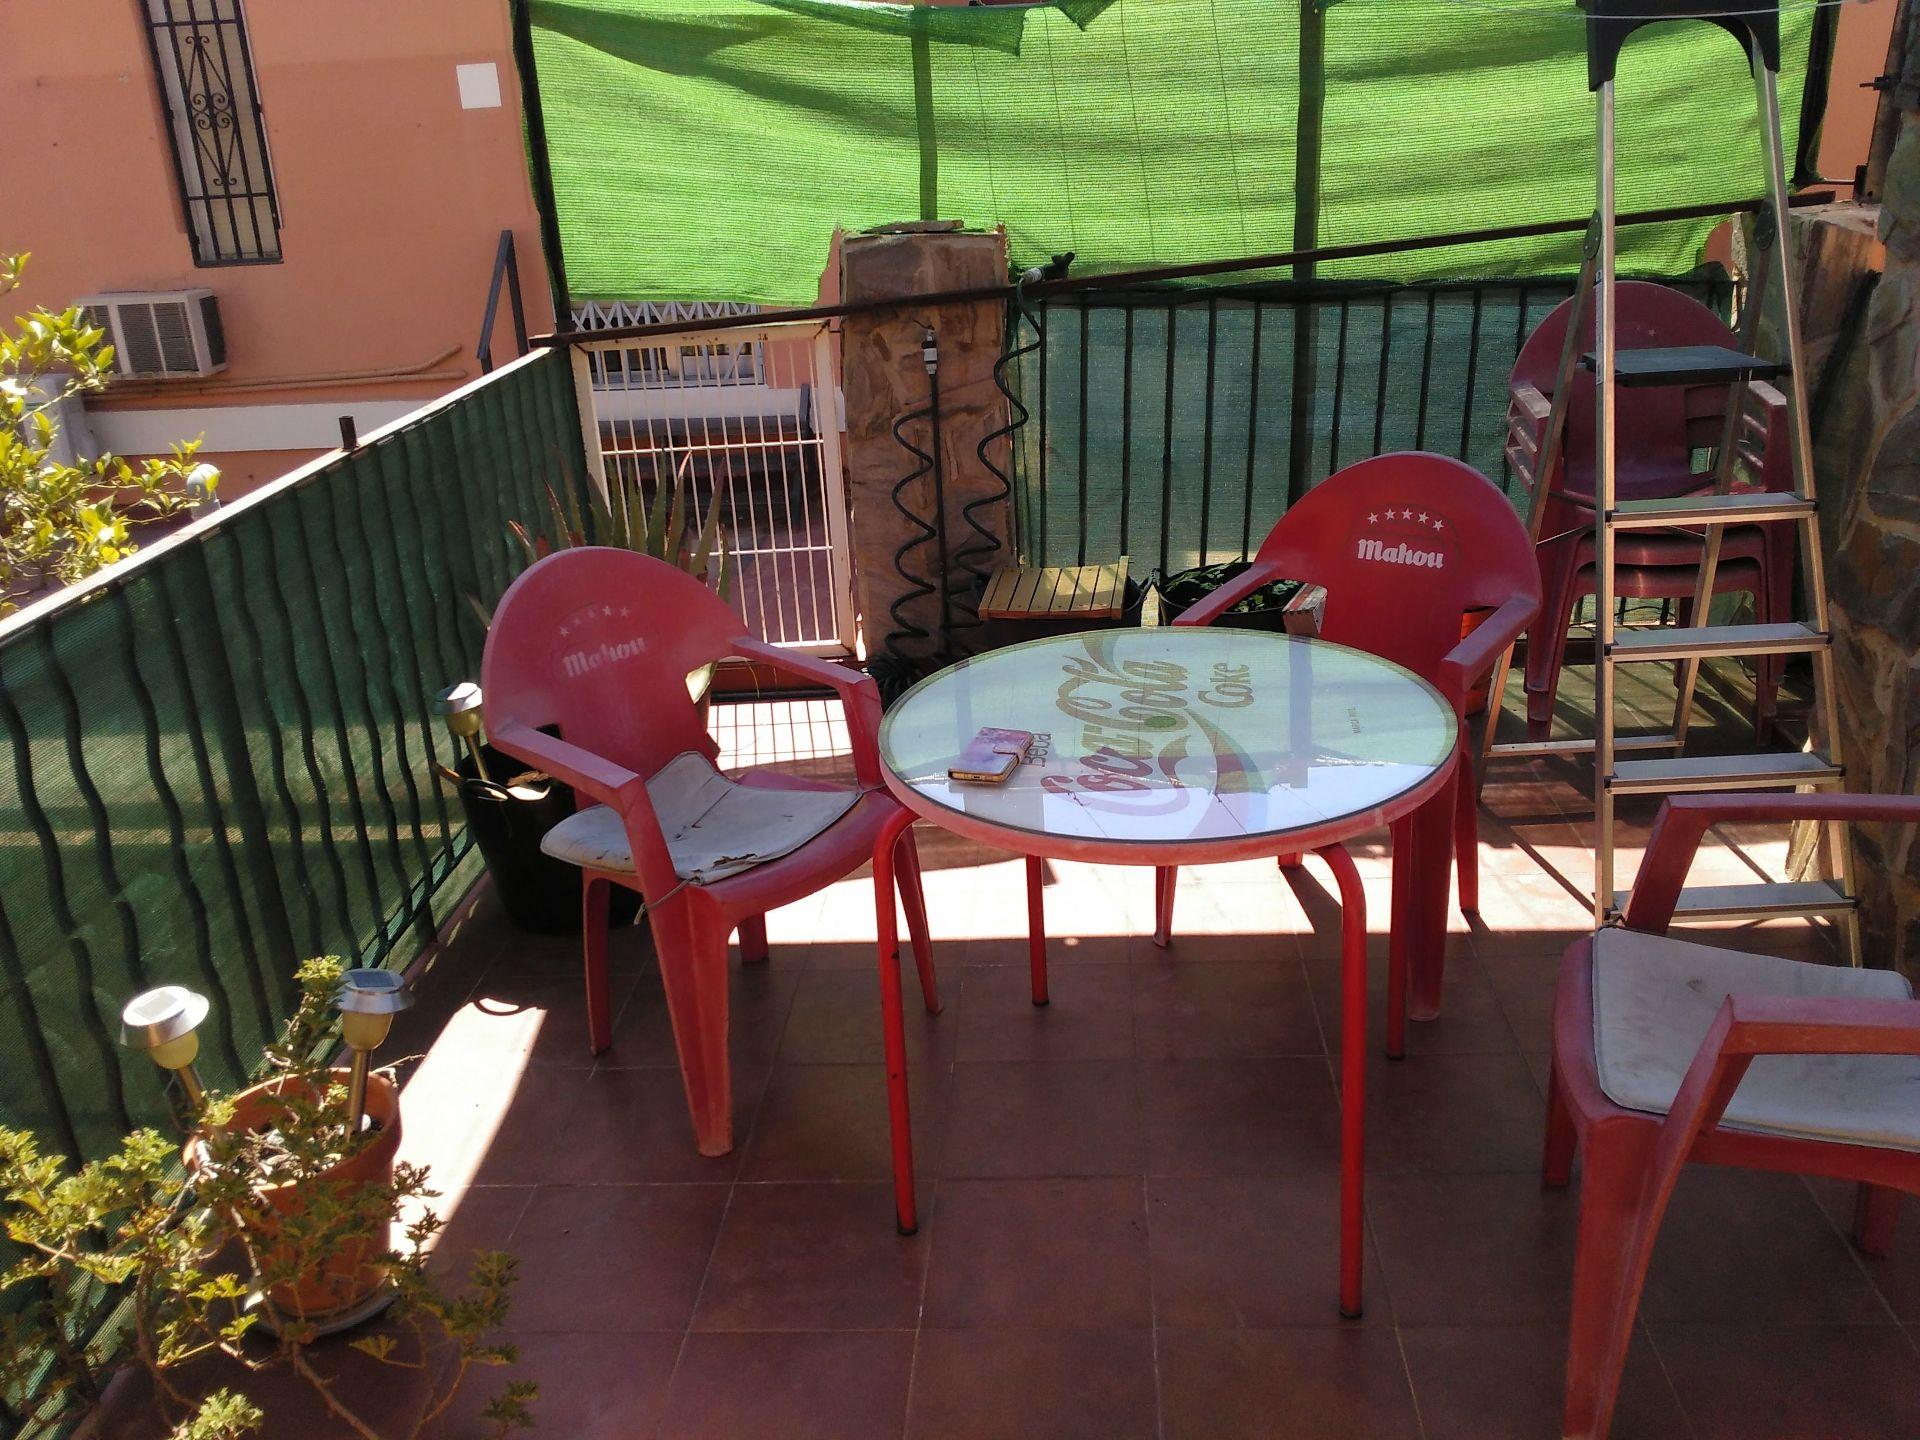 Casa / Chalet en Valencia, L'HORT DE SANABRE, venta